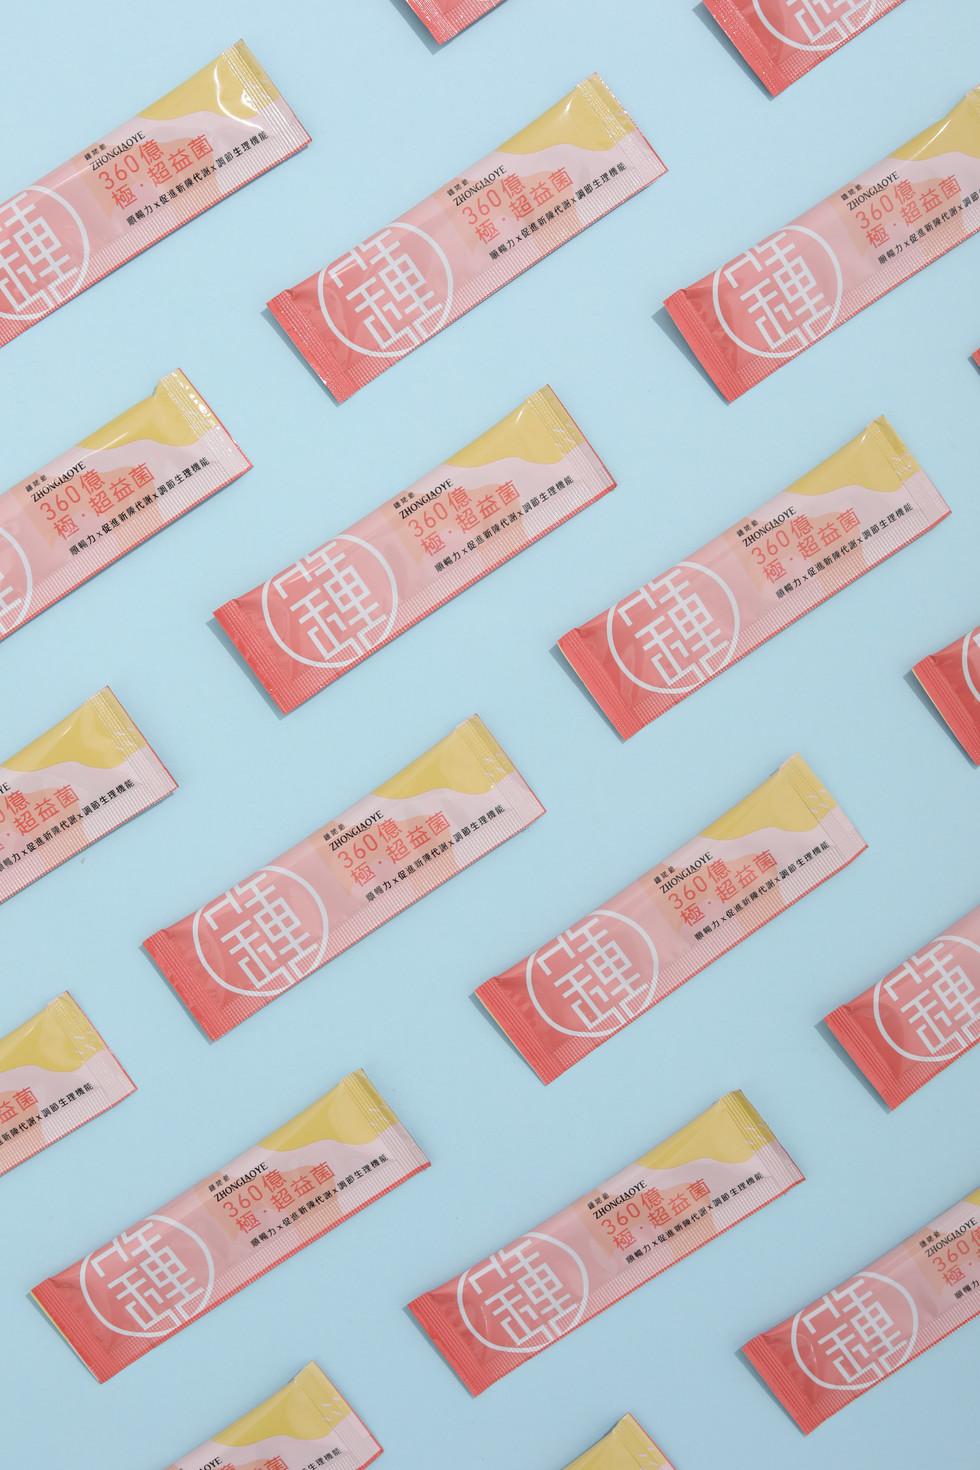 360億超益菌 | Packaging Design